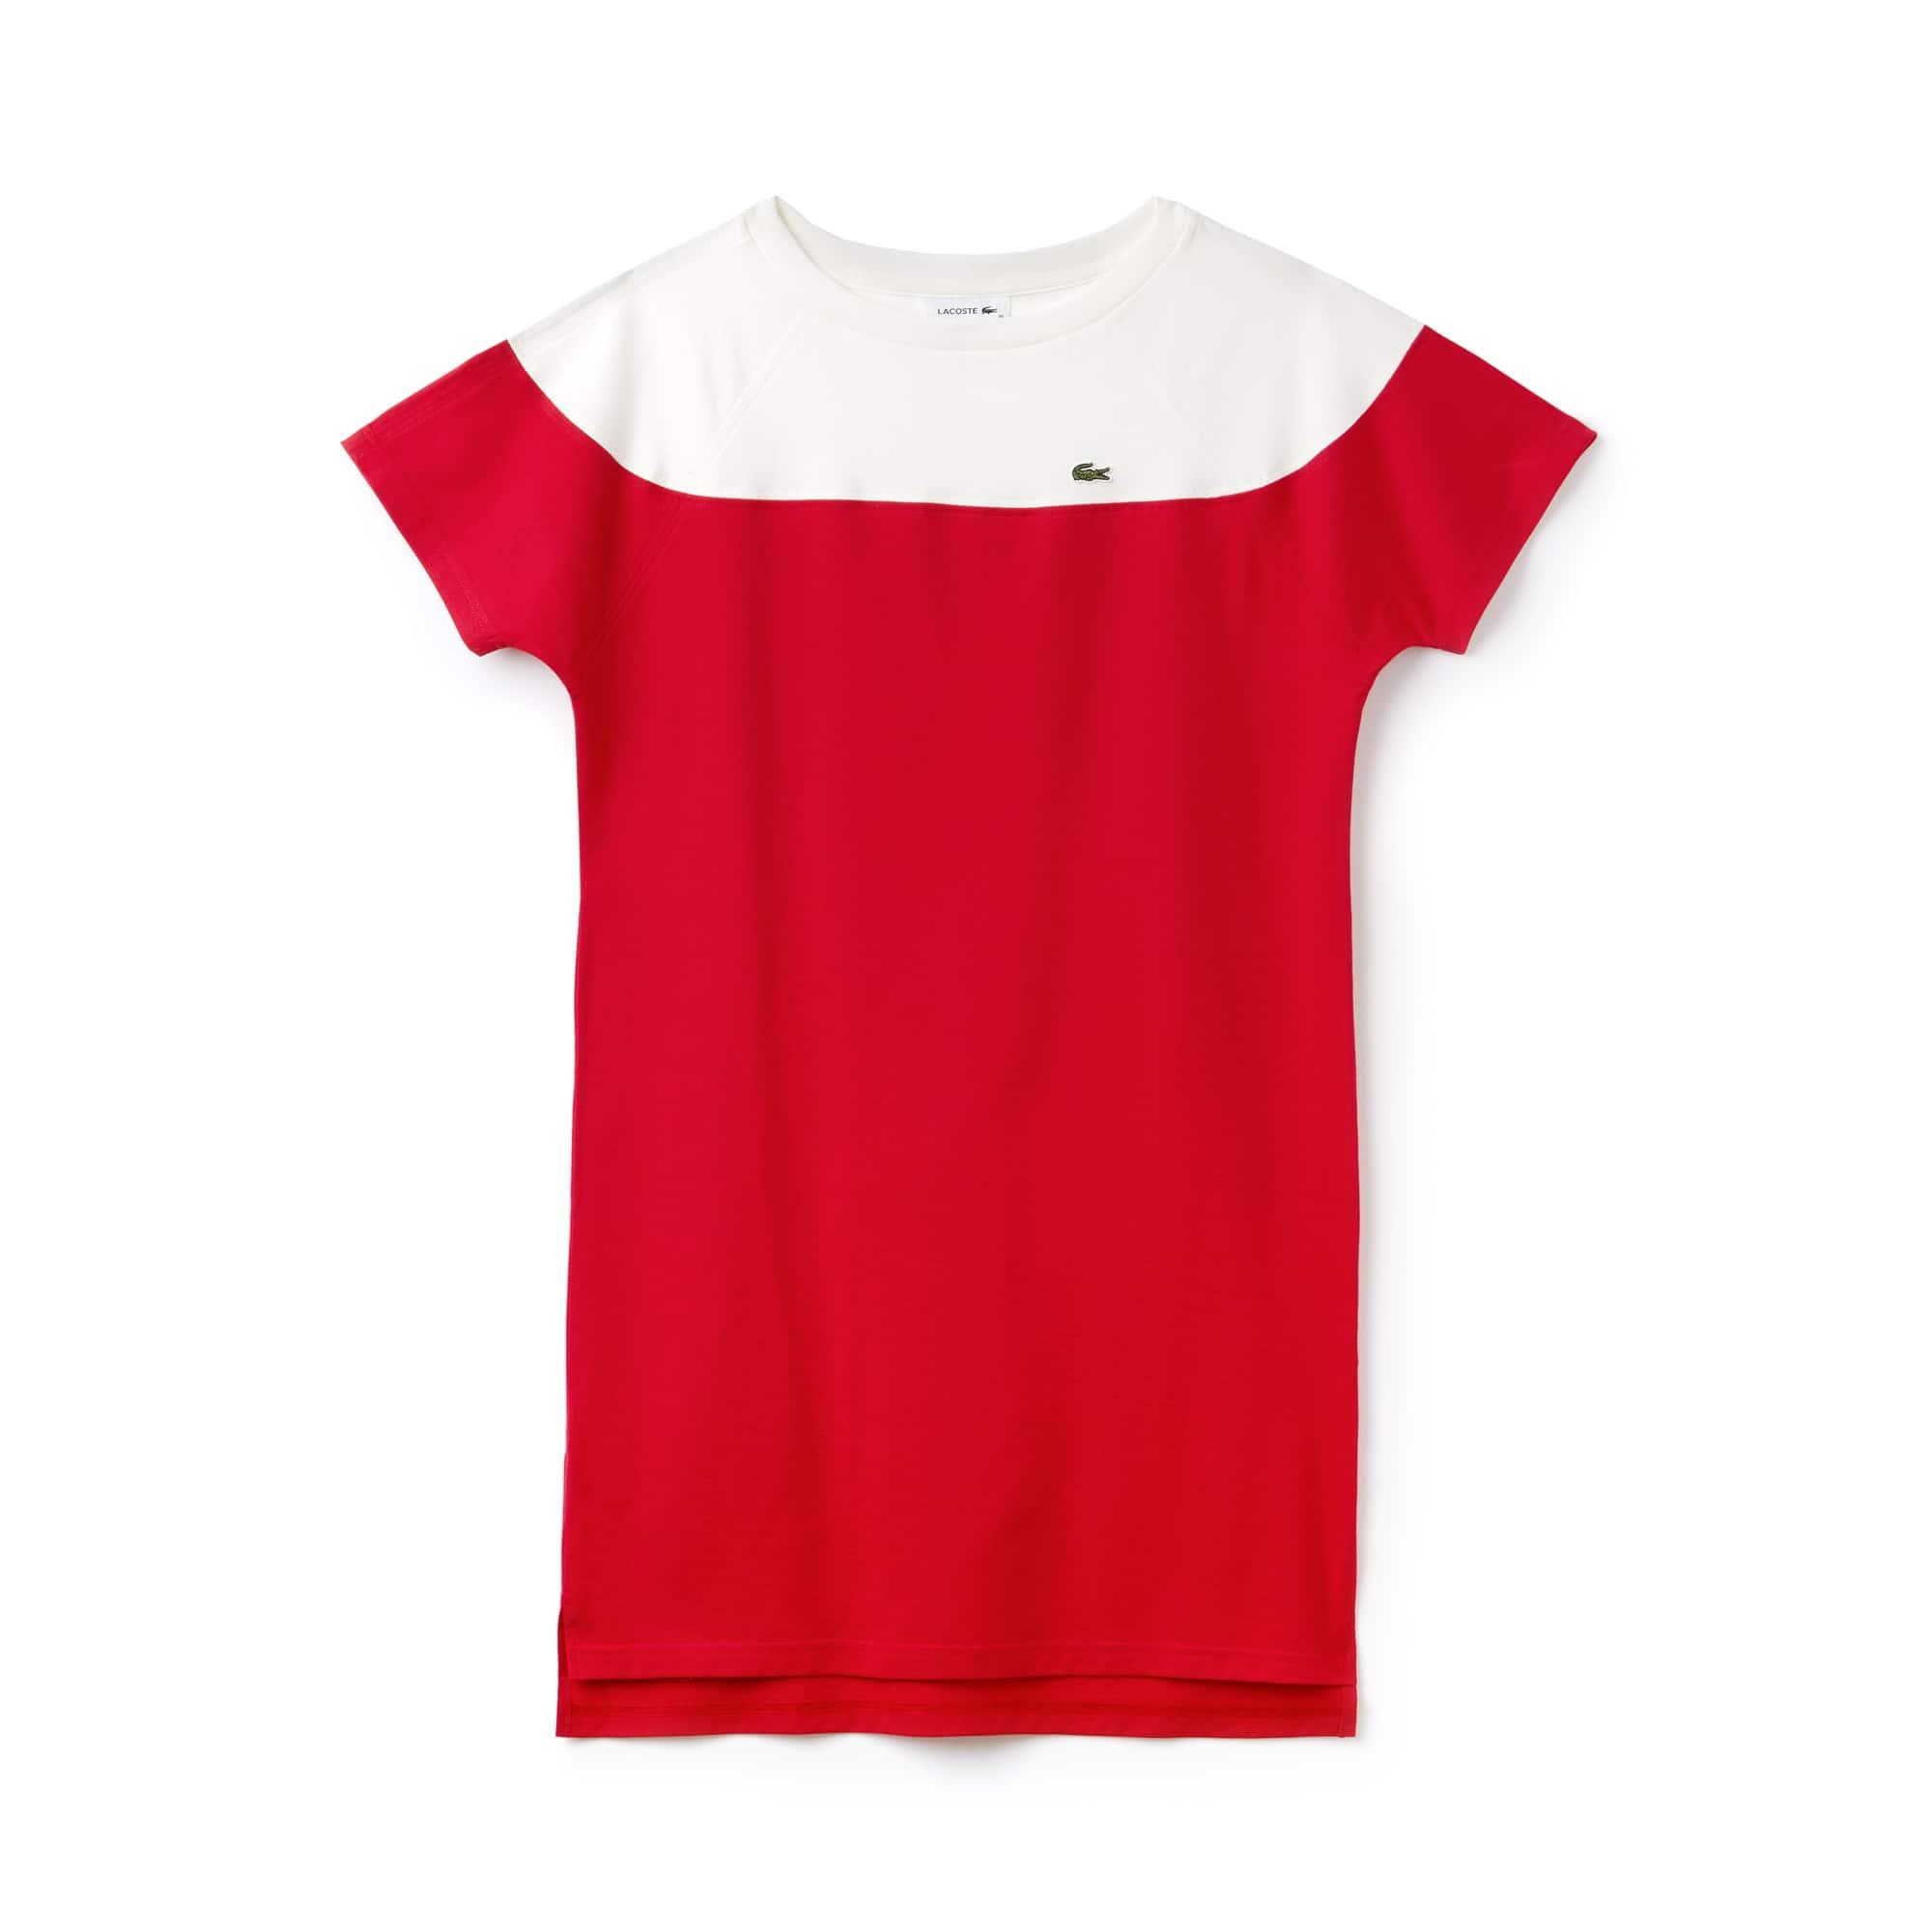 Damen-T-Shirt-Kleid aus Baumwolljersey mit U-Boot-Ausschnitt